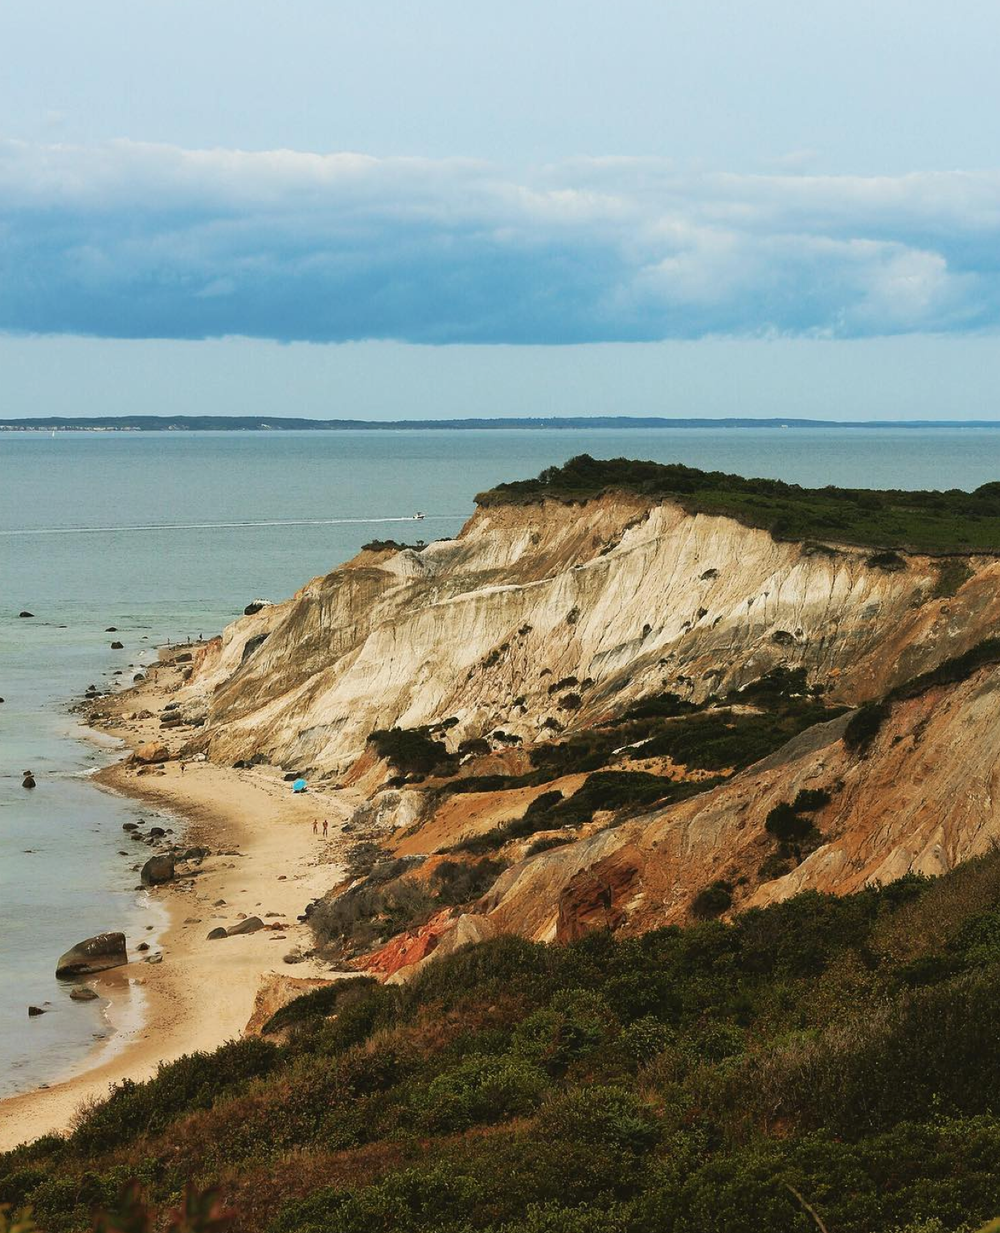 The cliffs at Gayhead